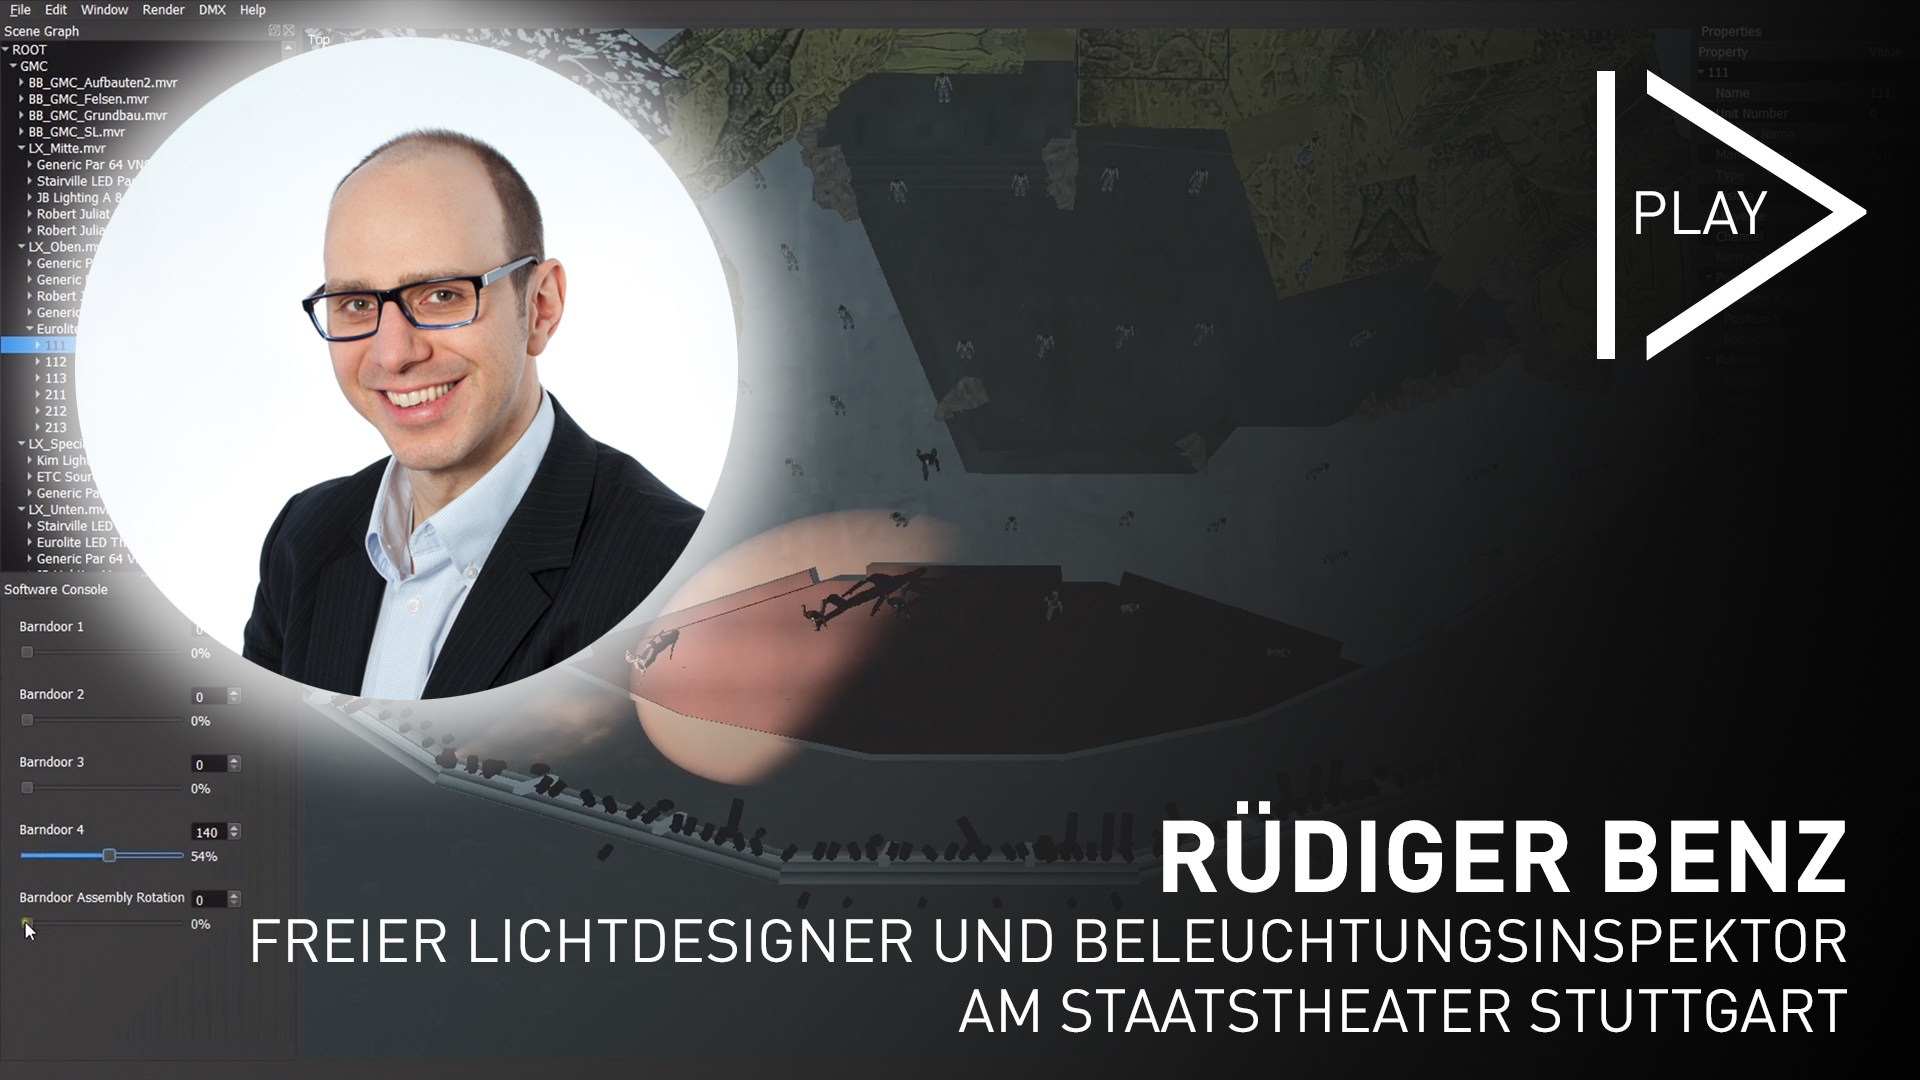 Rüdiger_Benz-Lichtdesigner-PLS-Vectorworks-Spotlight-2020